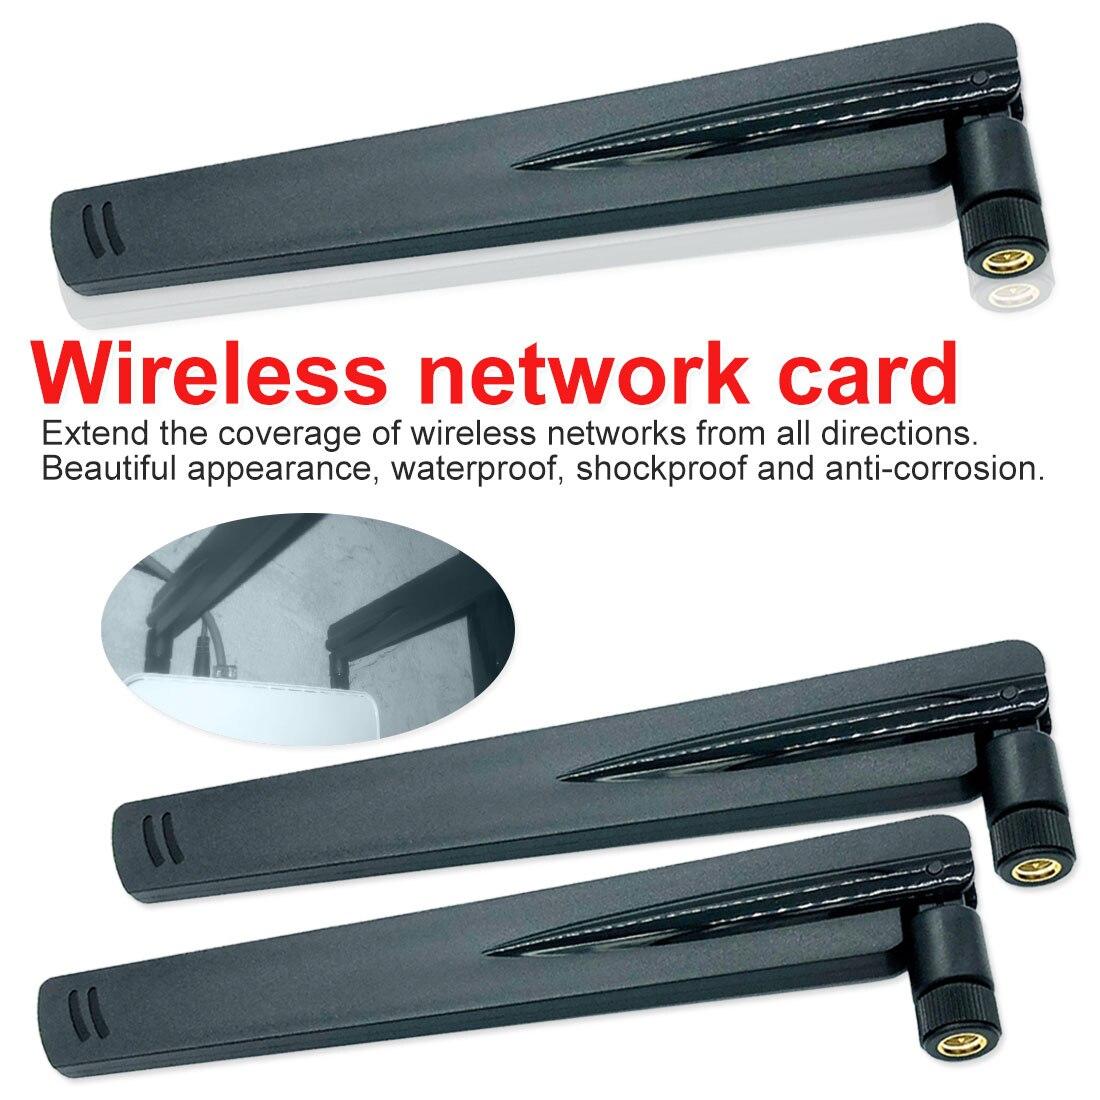 2.4Ghz Antennas 18 dbi Aerial Wireless WIFI Antenna Booster Universal Antennas Amplifier WLAN Router RP-SMA Male Connector